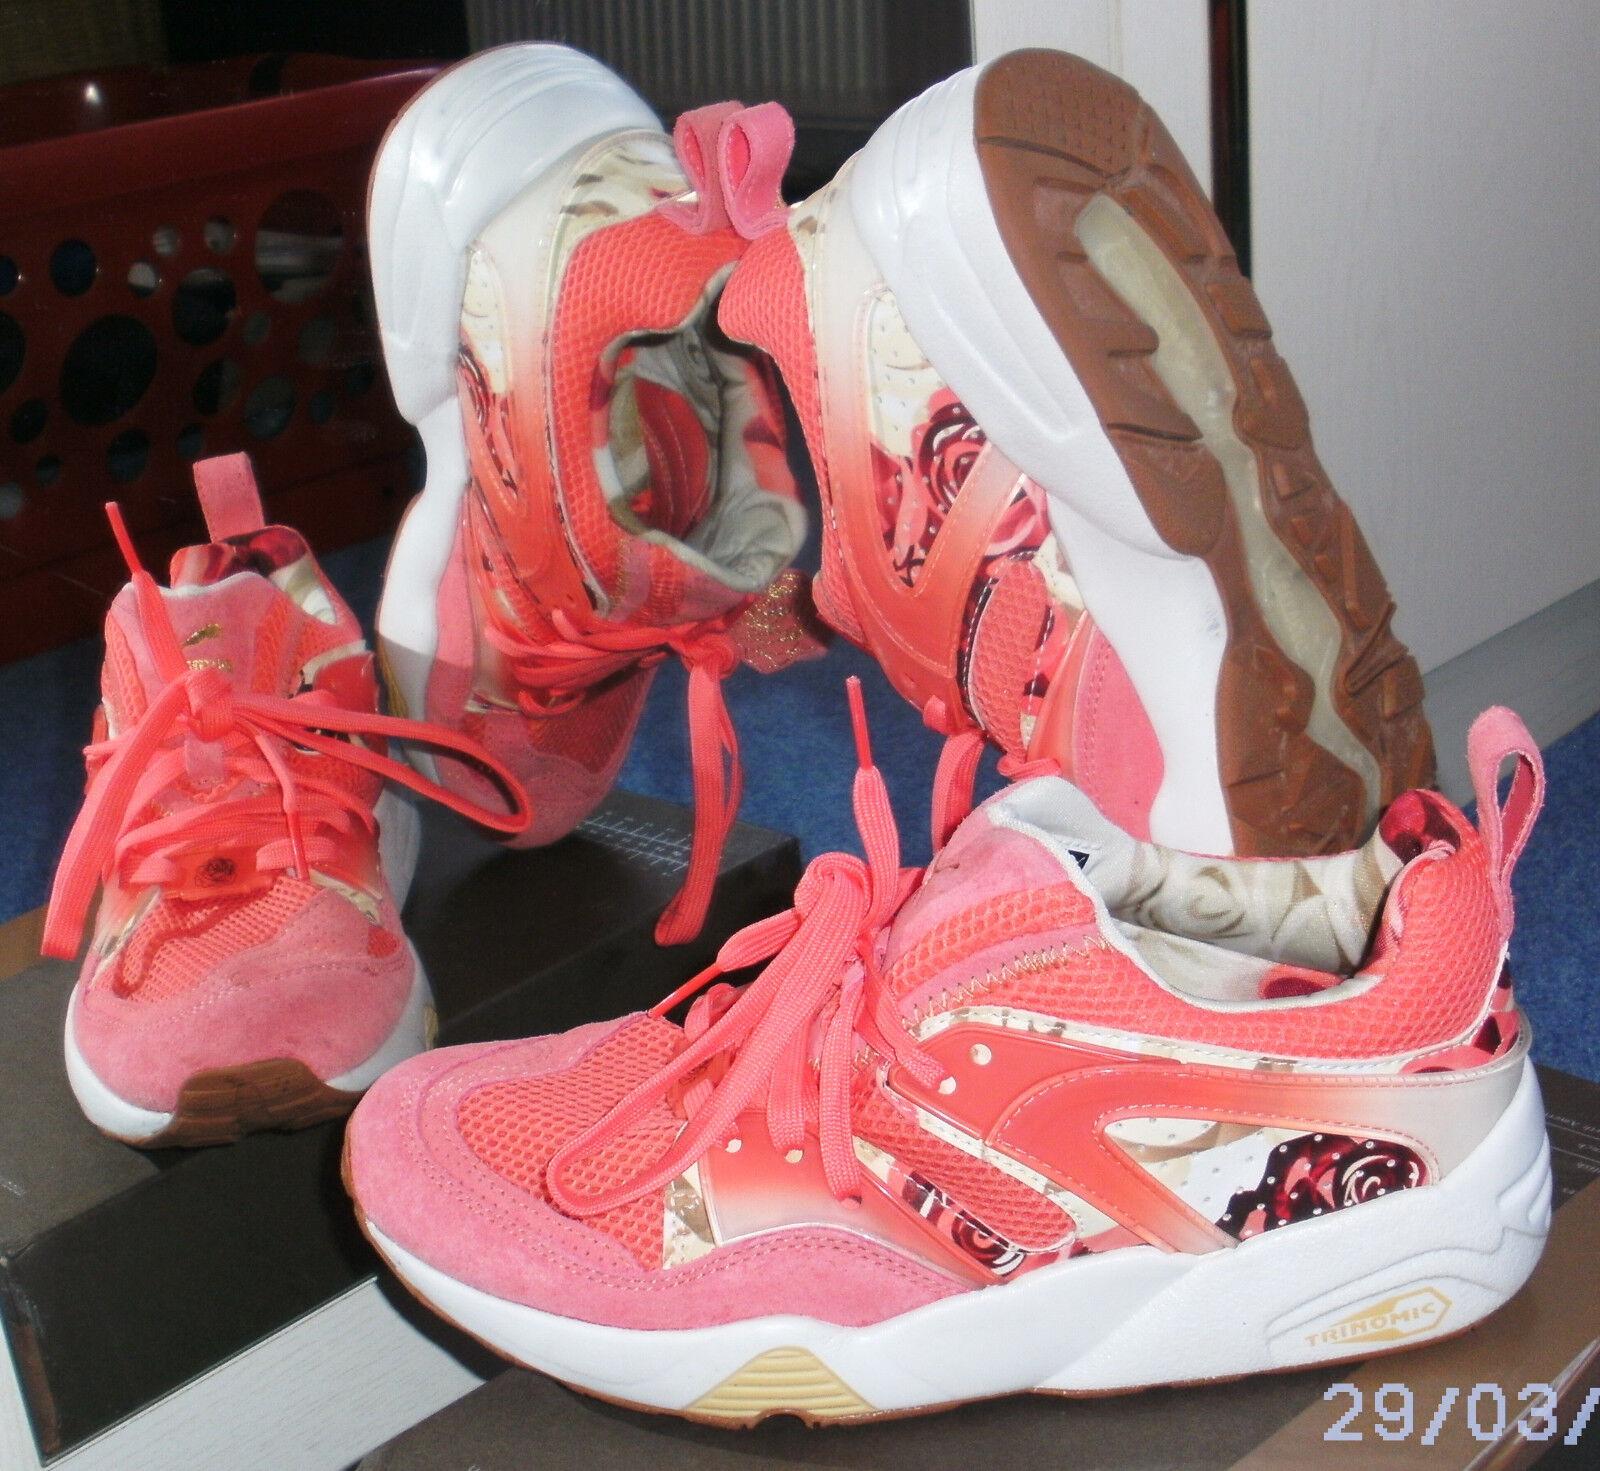 Neue Puma Blaze of Glory X Careaux Graphic Sneaker Laufschuhe Trinomic, Gr. 38